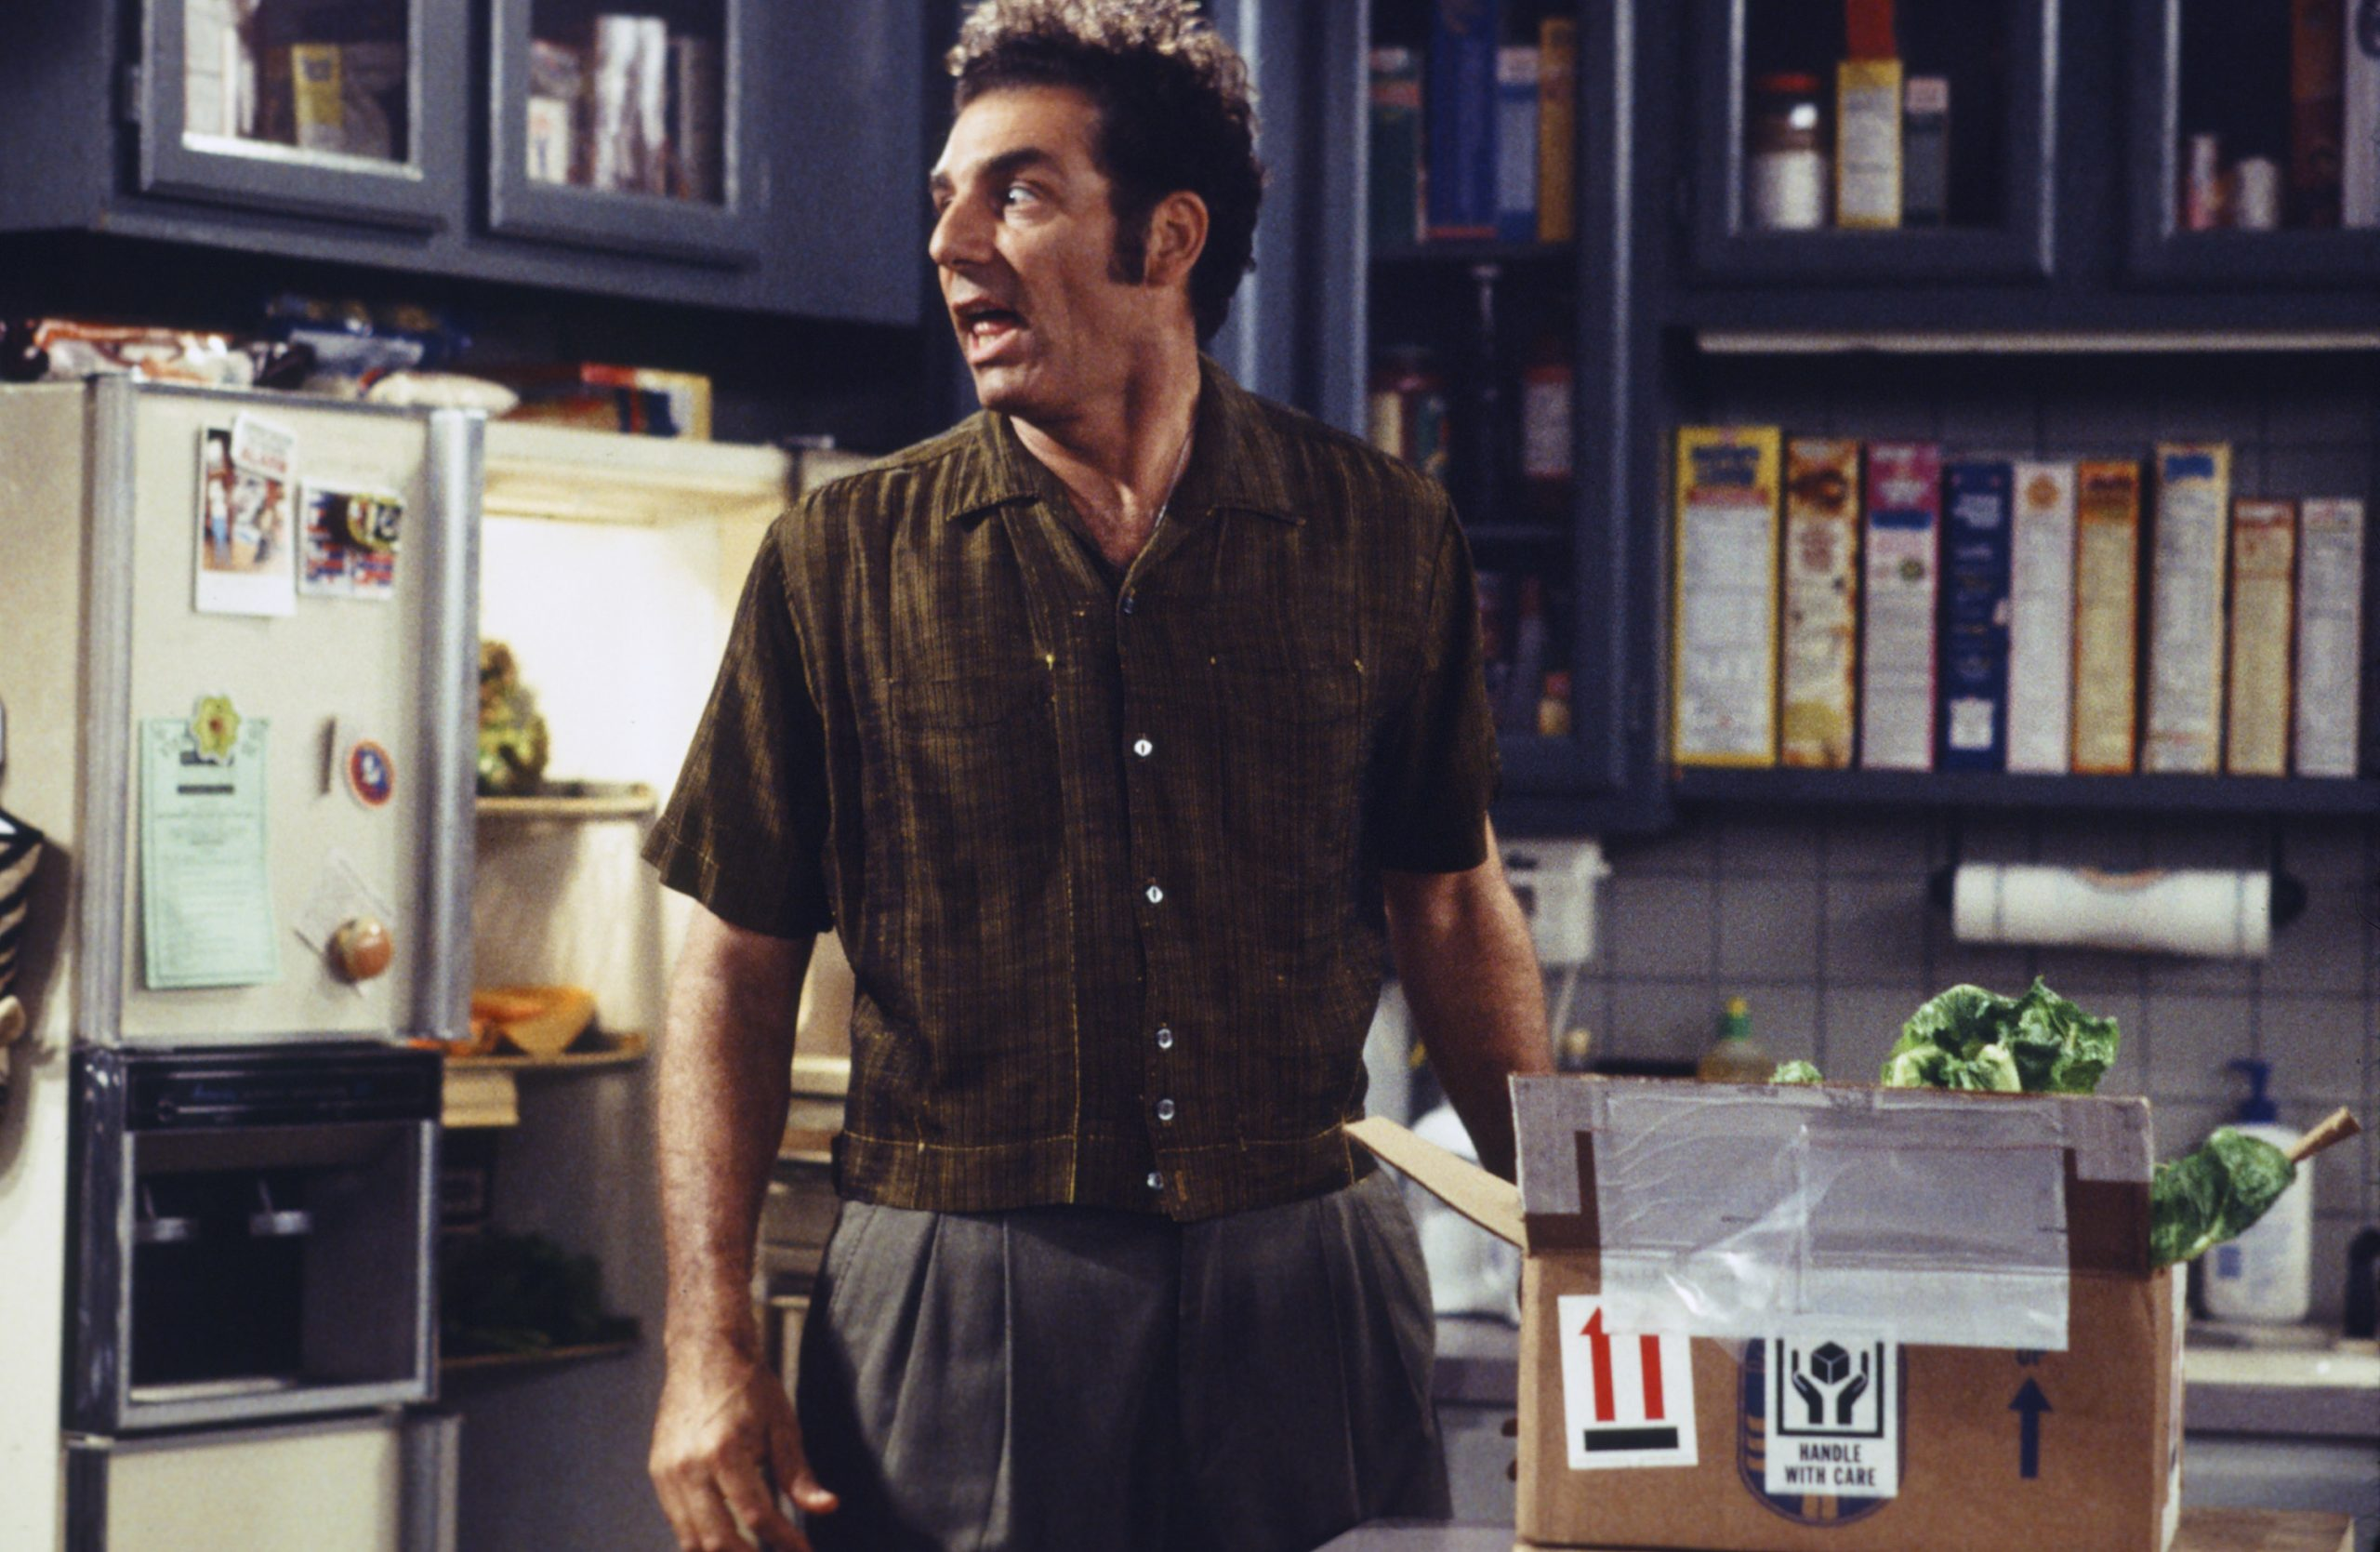 Michael Richards as Kramer